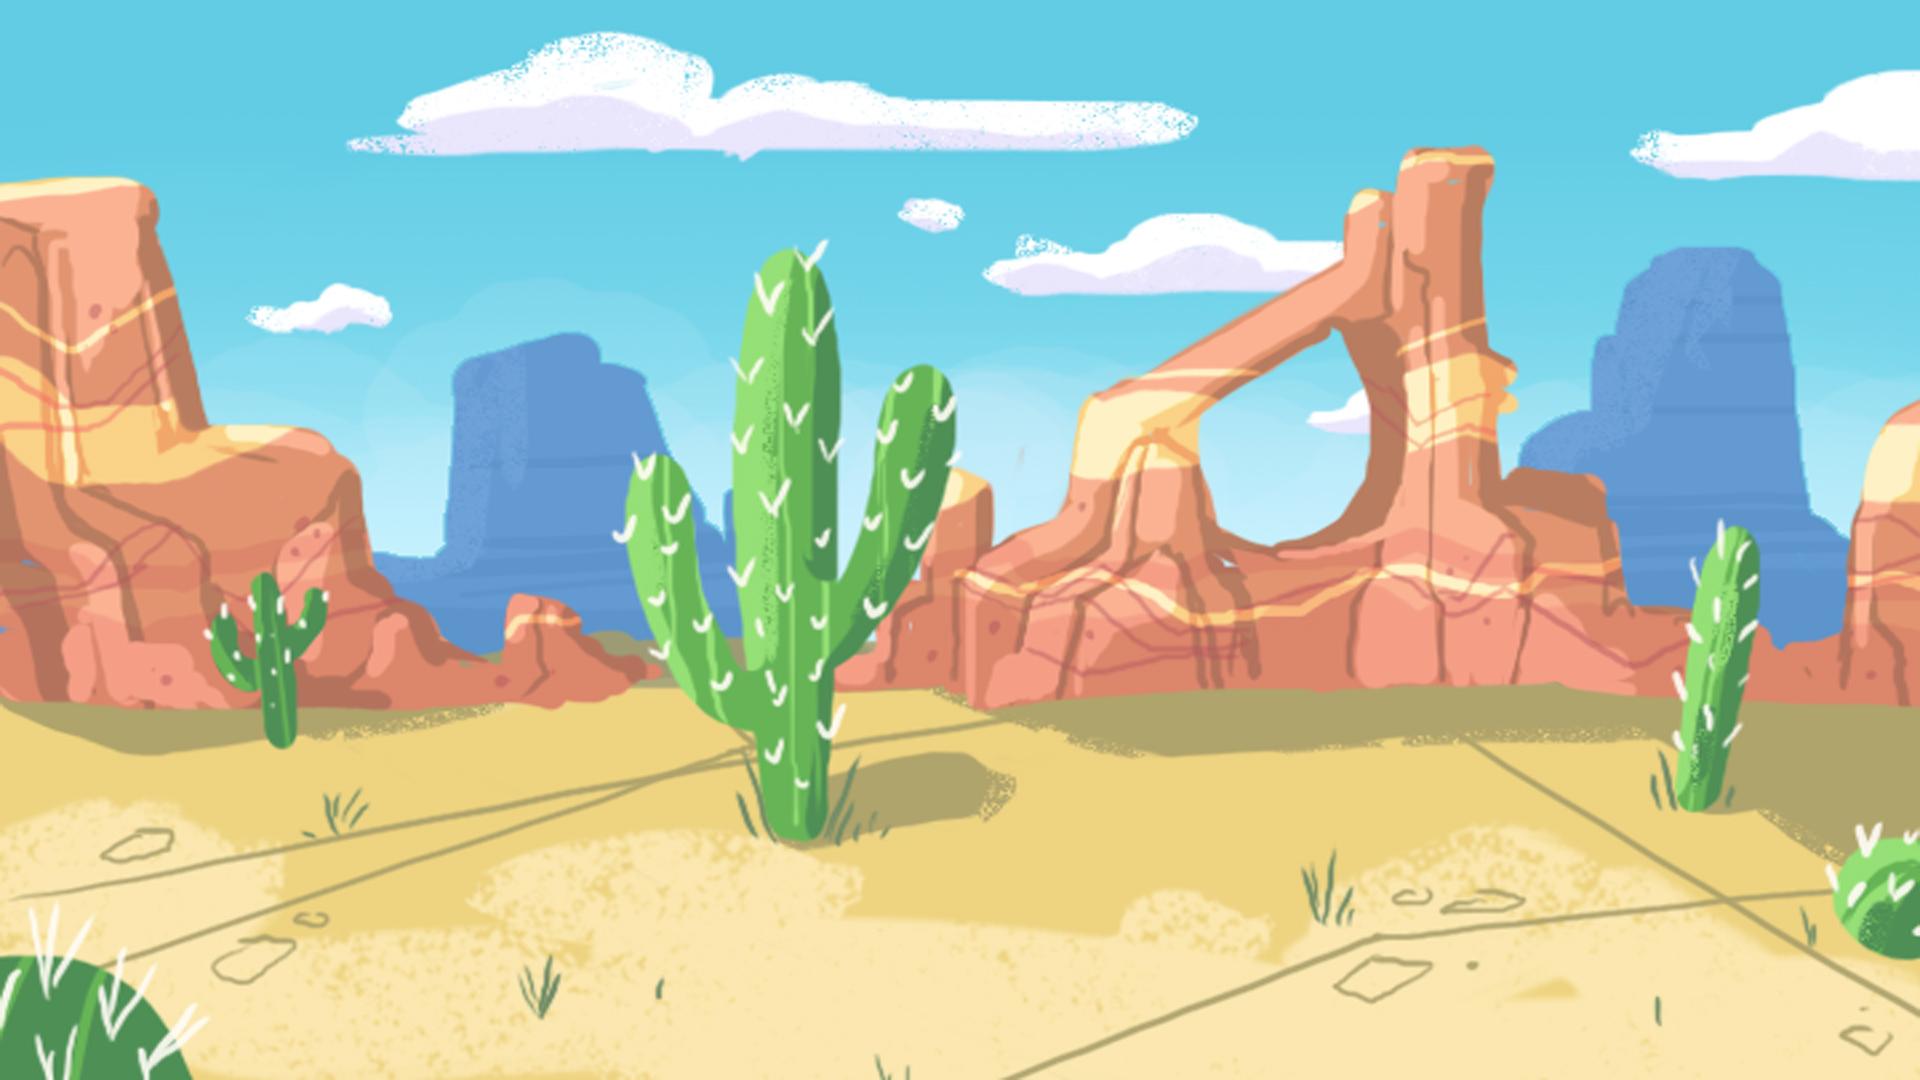 travale_westernl_landscape.jpg